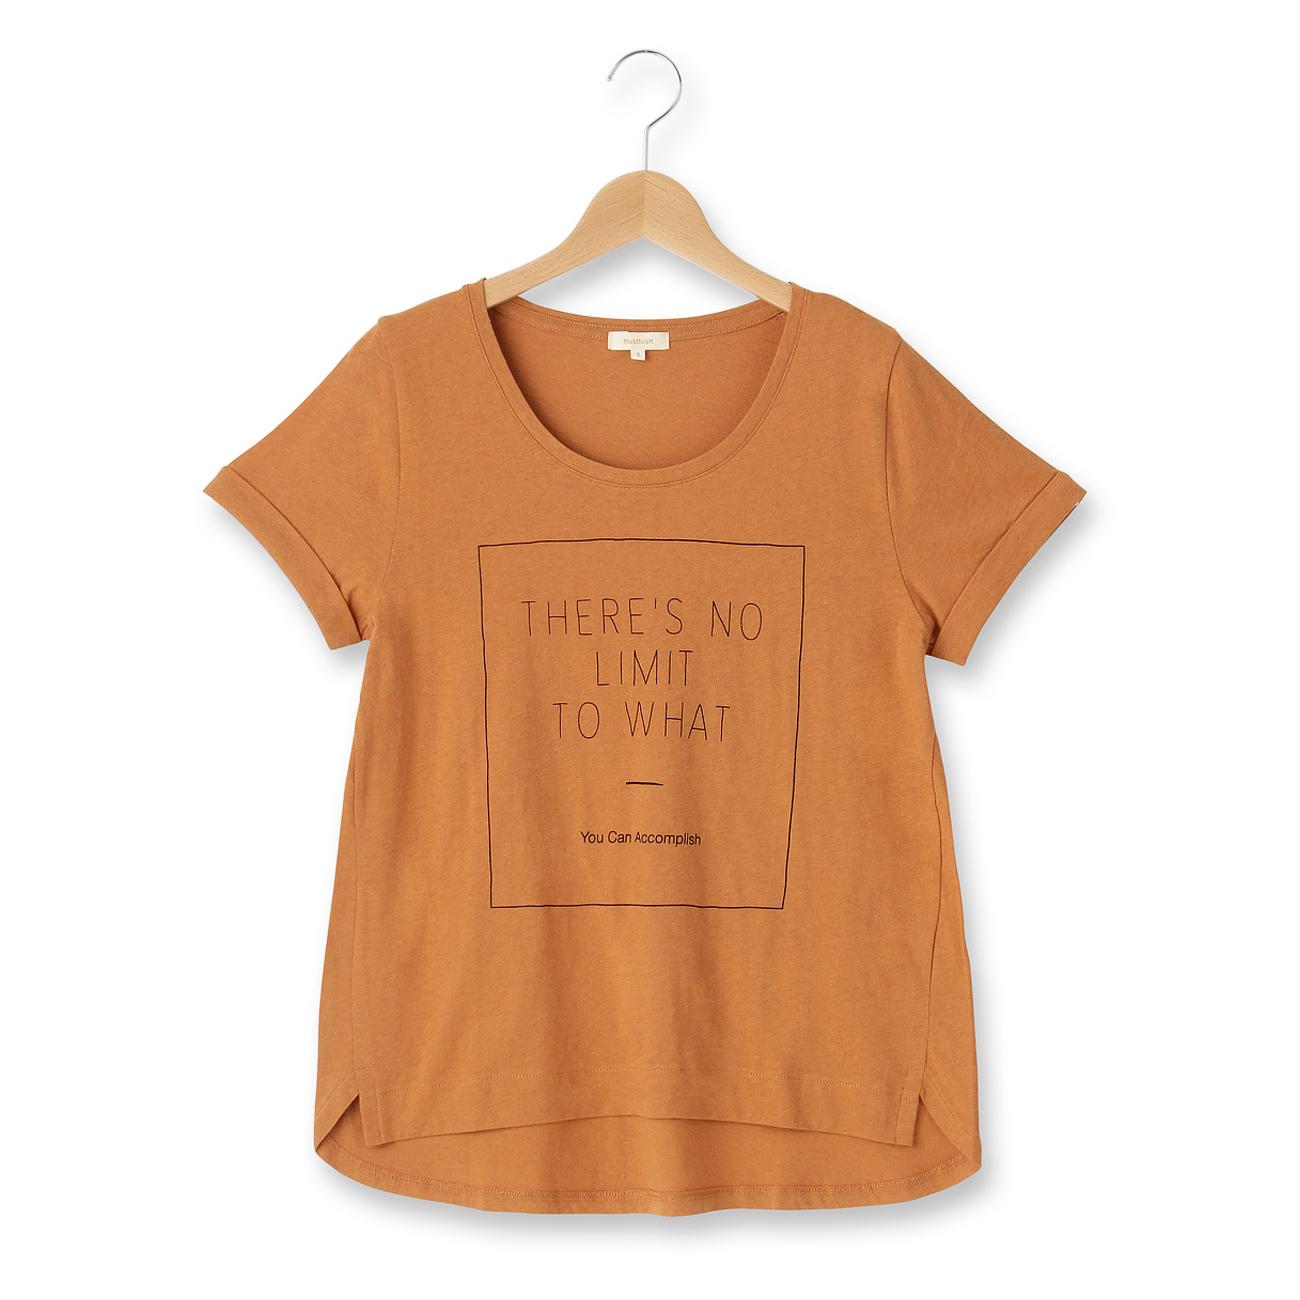 【HusHusH (ハッシュアッシュ)】綿麻ロゴプルオーバーレディース トップス カットソー・Tシャツ ブラウン